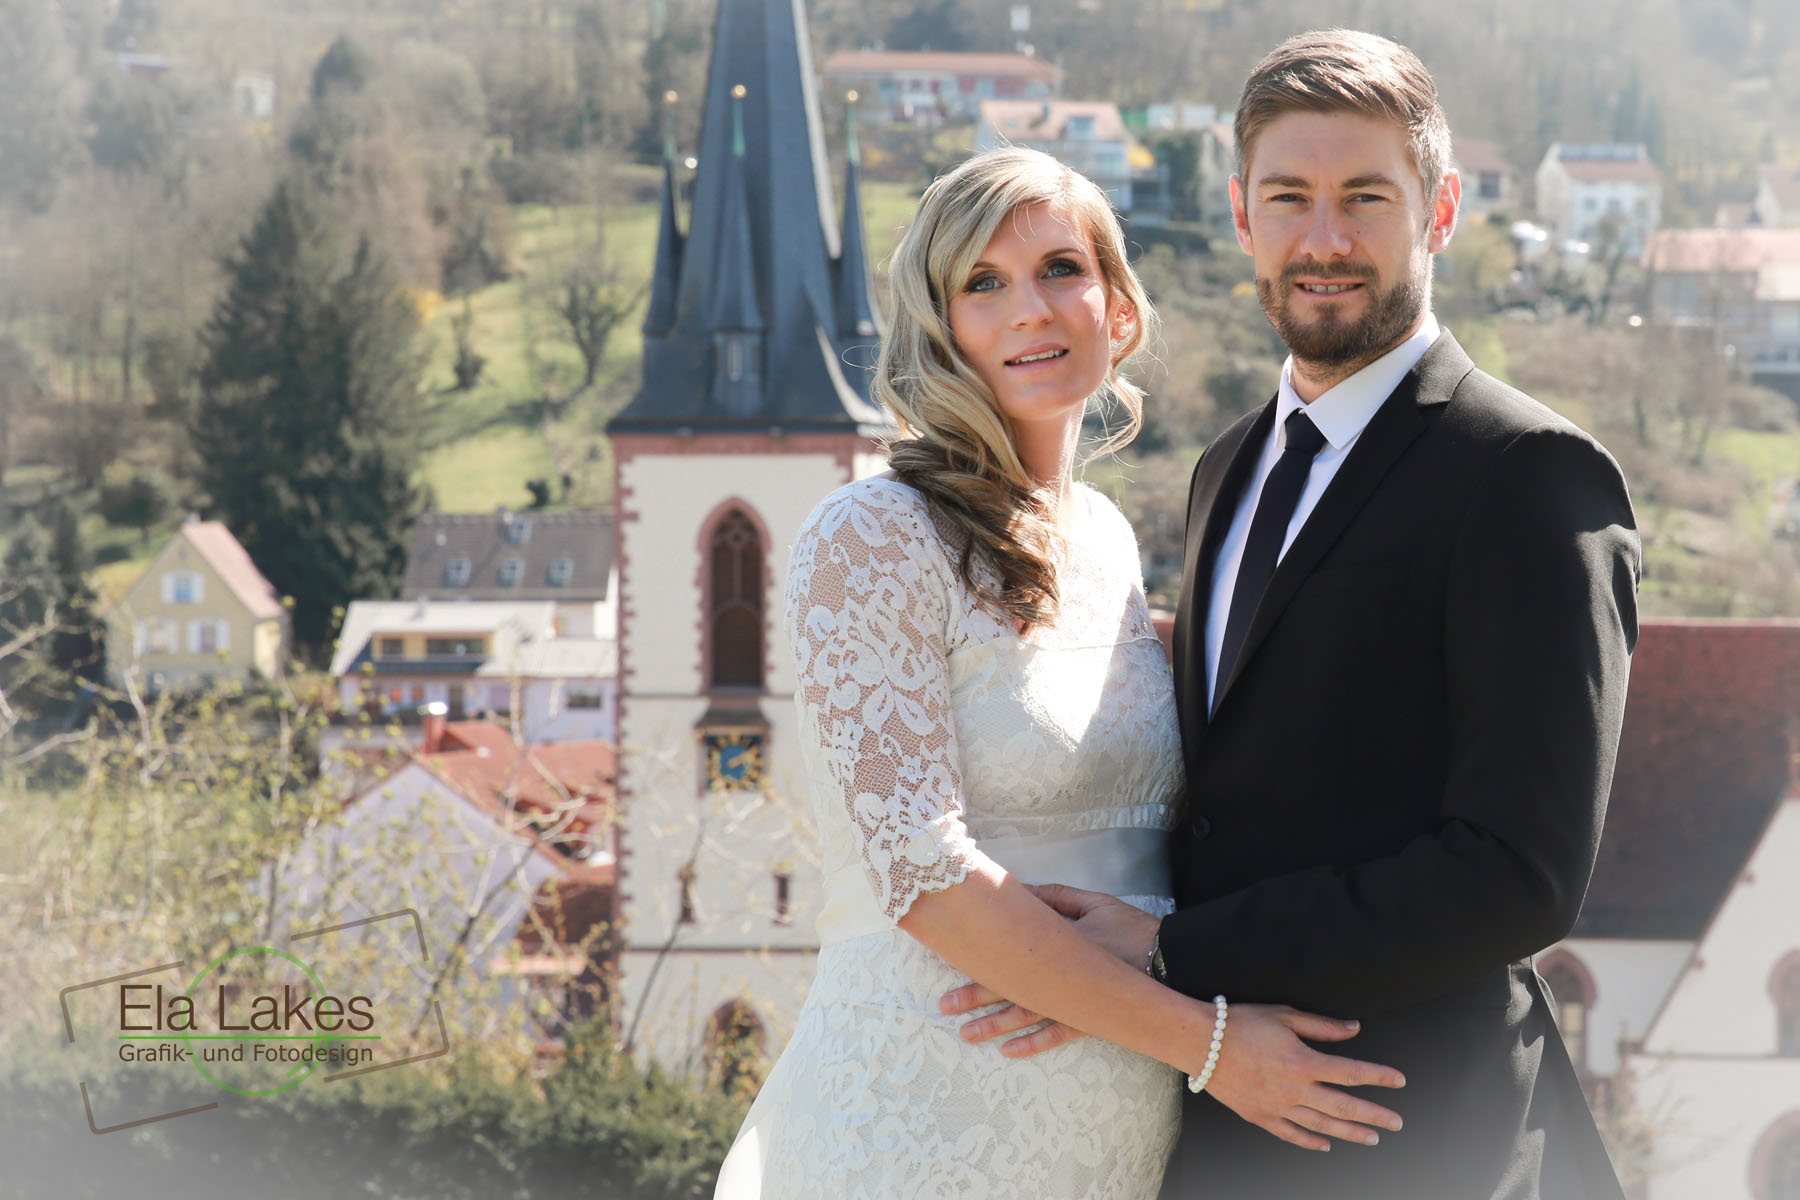 Hochzeitsfotograf Karlsruhe - ElaLakes Design -13